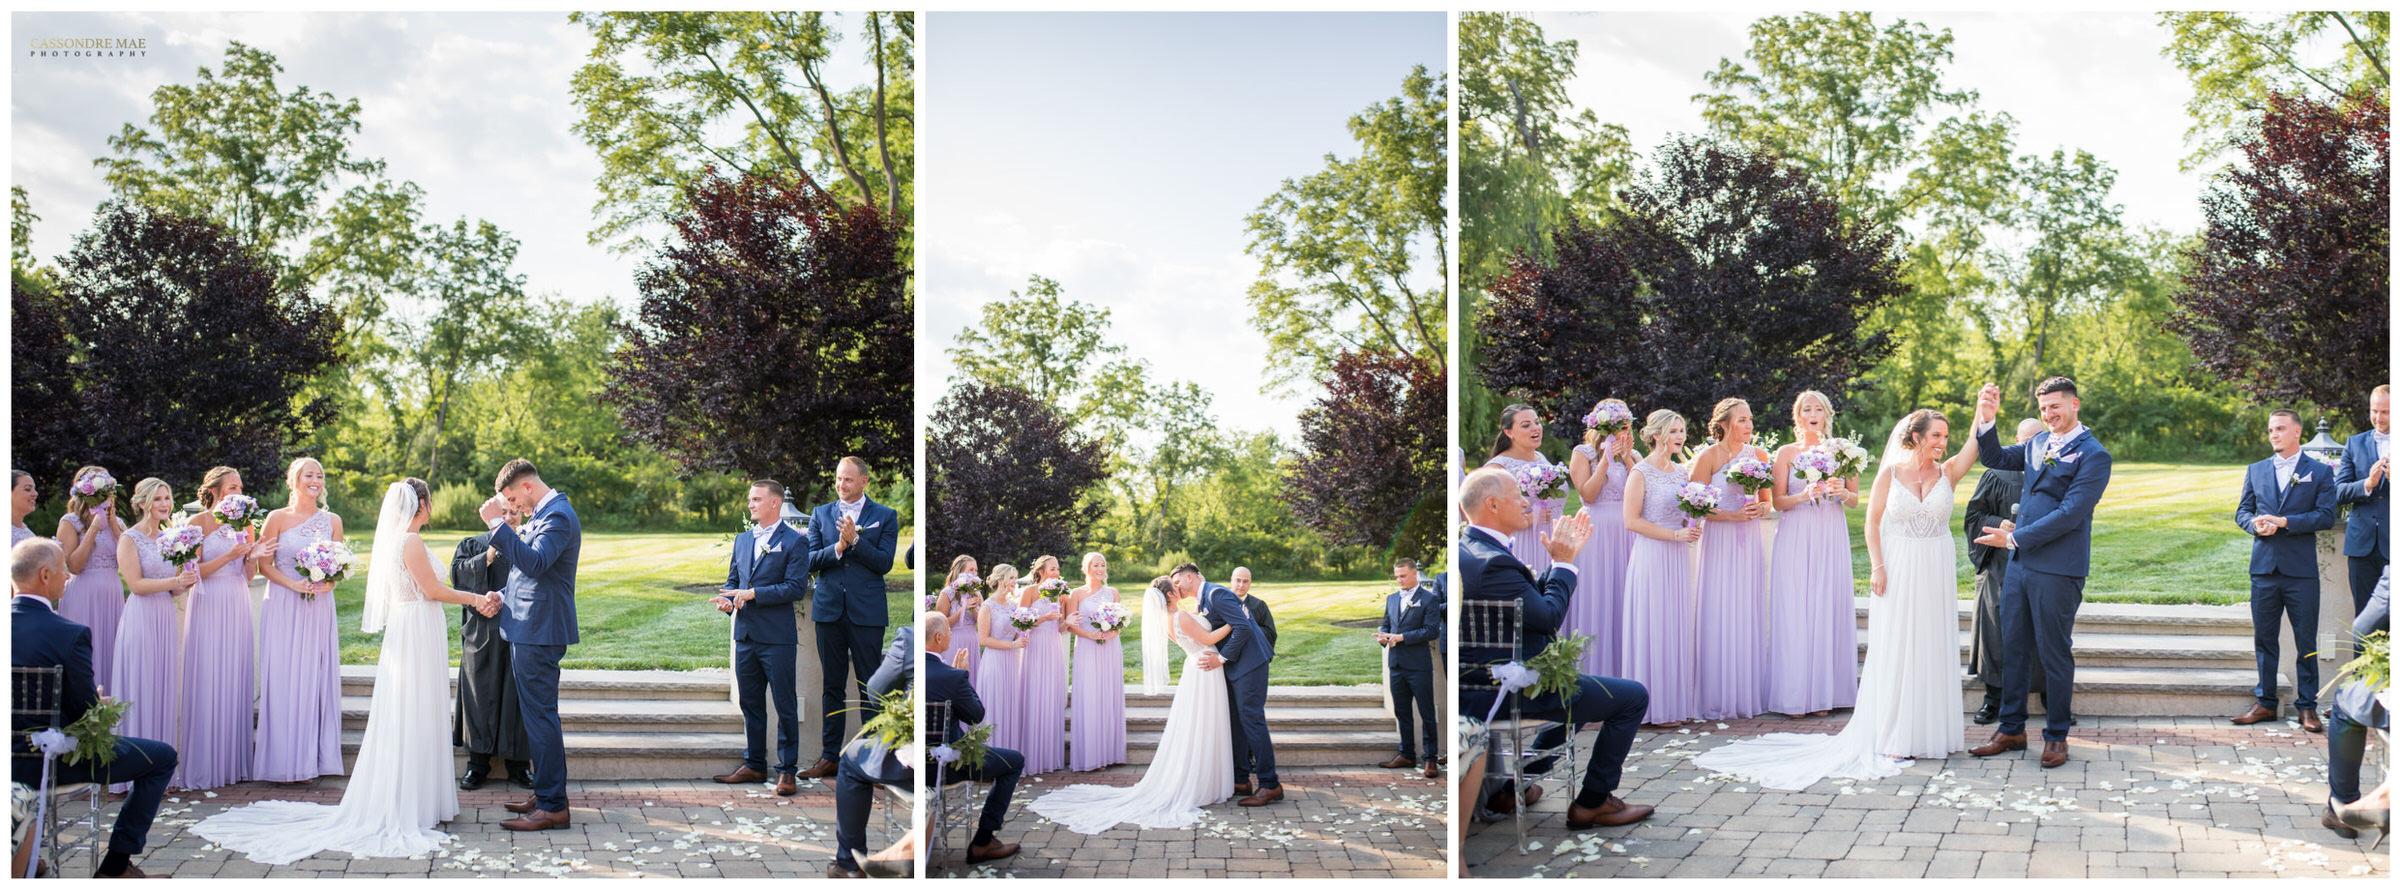 Cassondre Mae Photography Villa Venezia Wedding Photographer 14.jpg